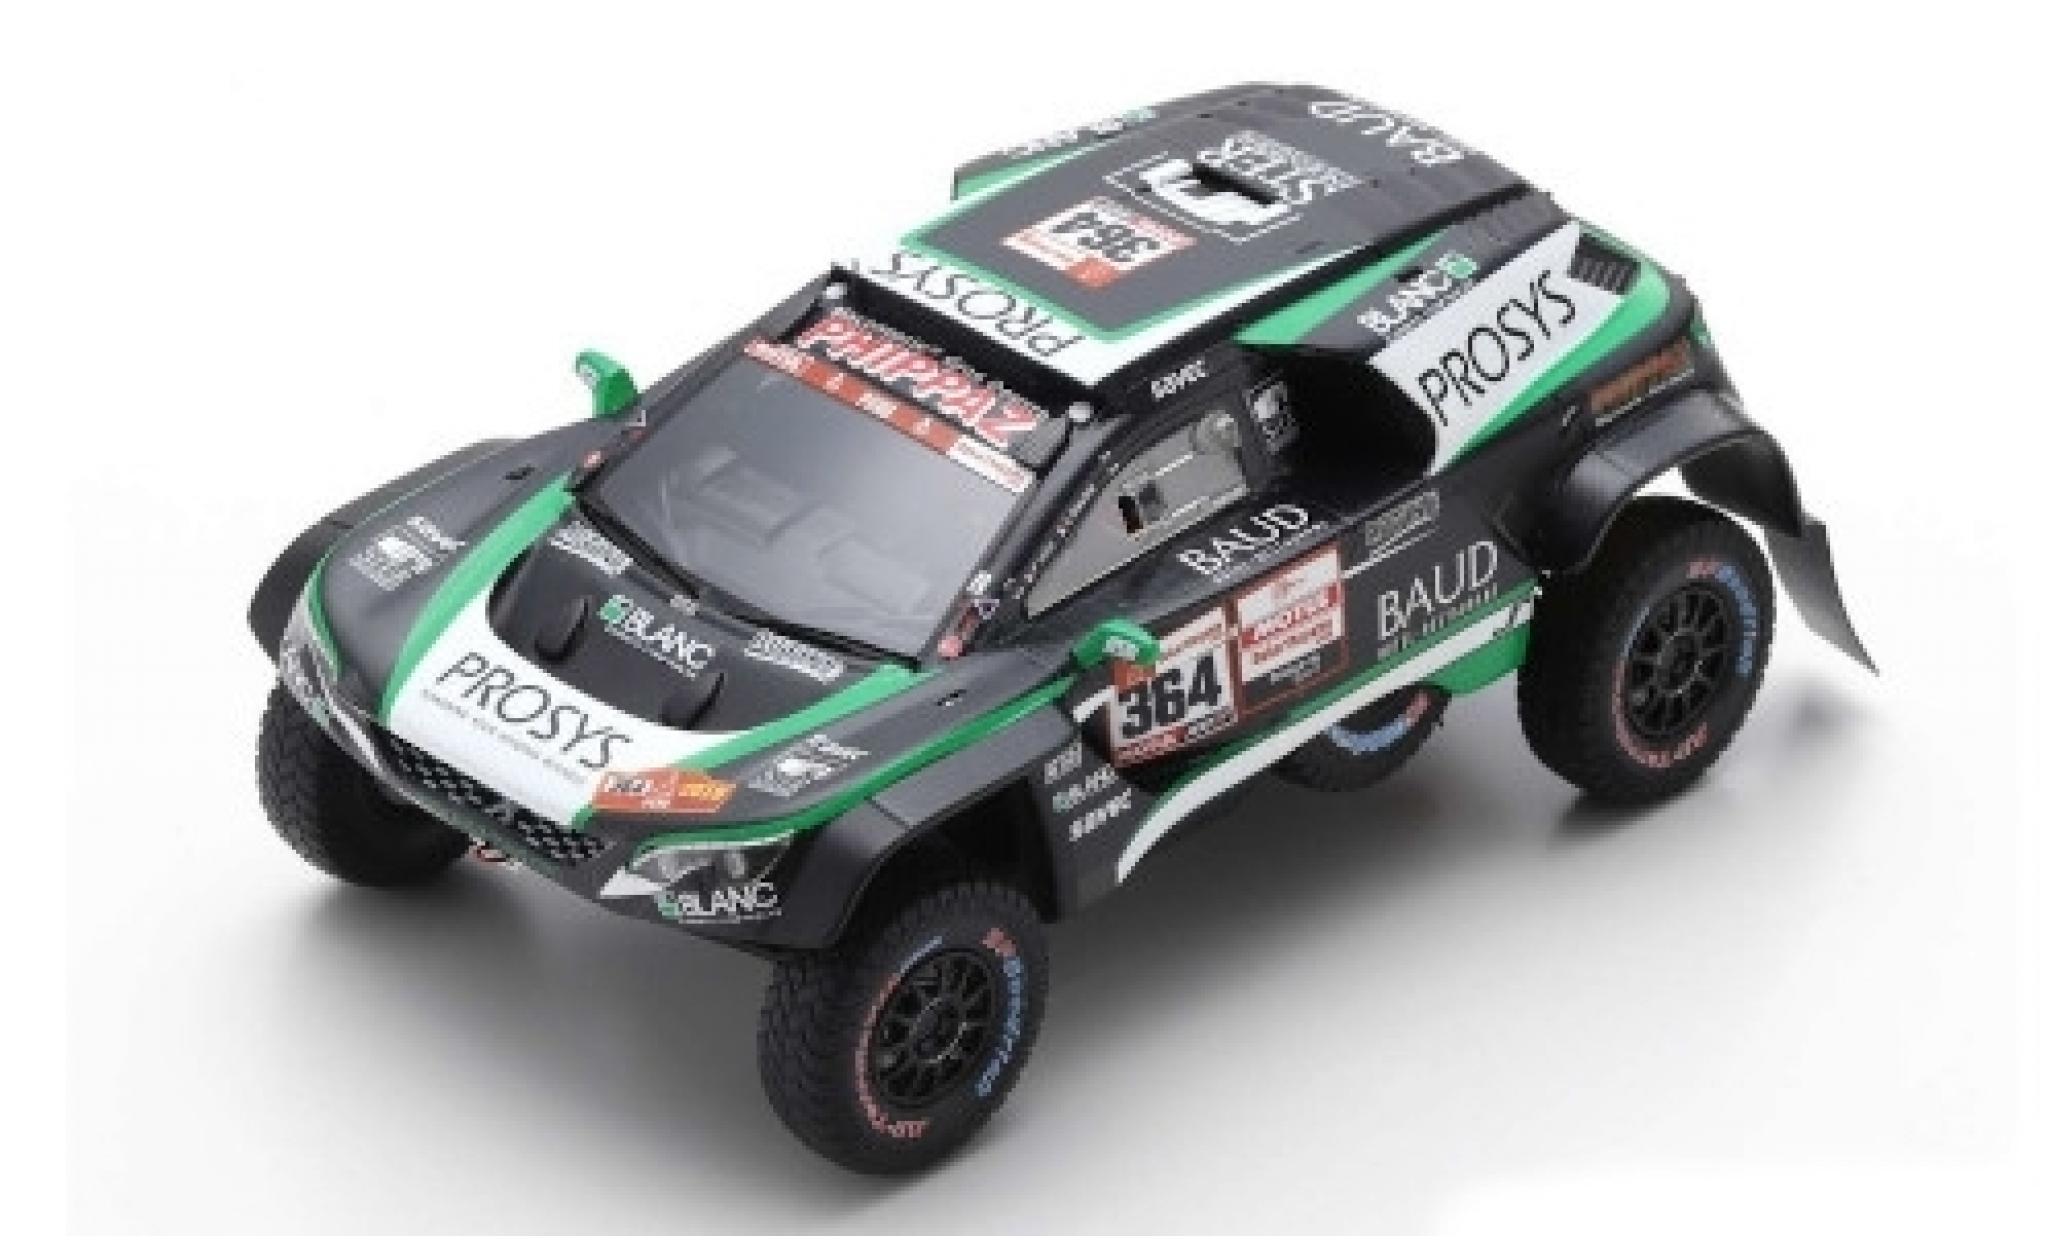 Peugeot 3008 1/43 Spark DKR Maxi No.364 Easy Rally Rallye Dakar 2019 P.Lafay/S.Delaunay